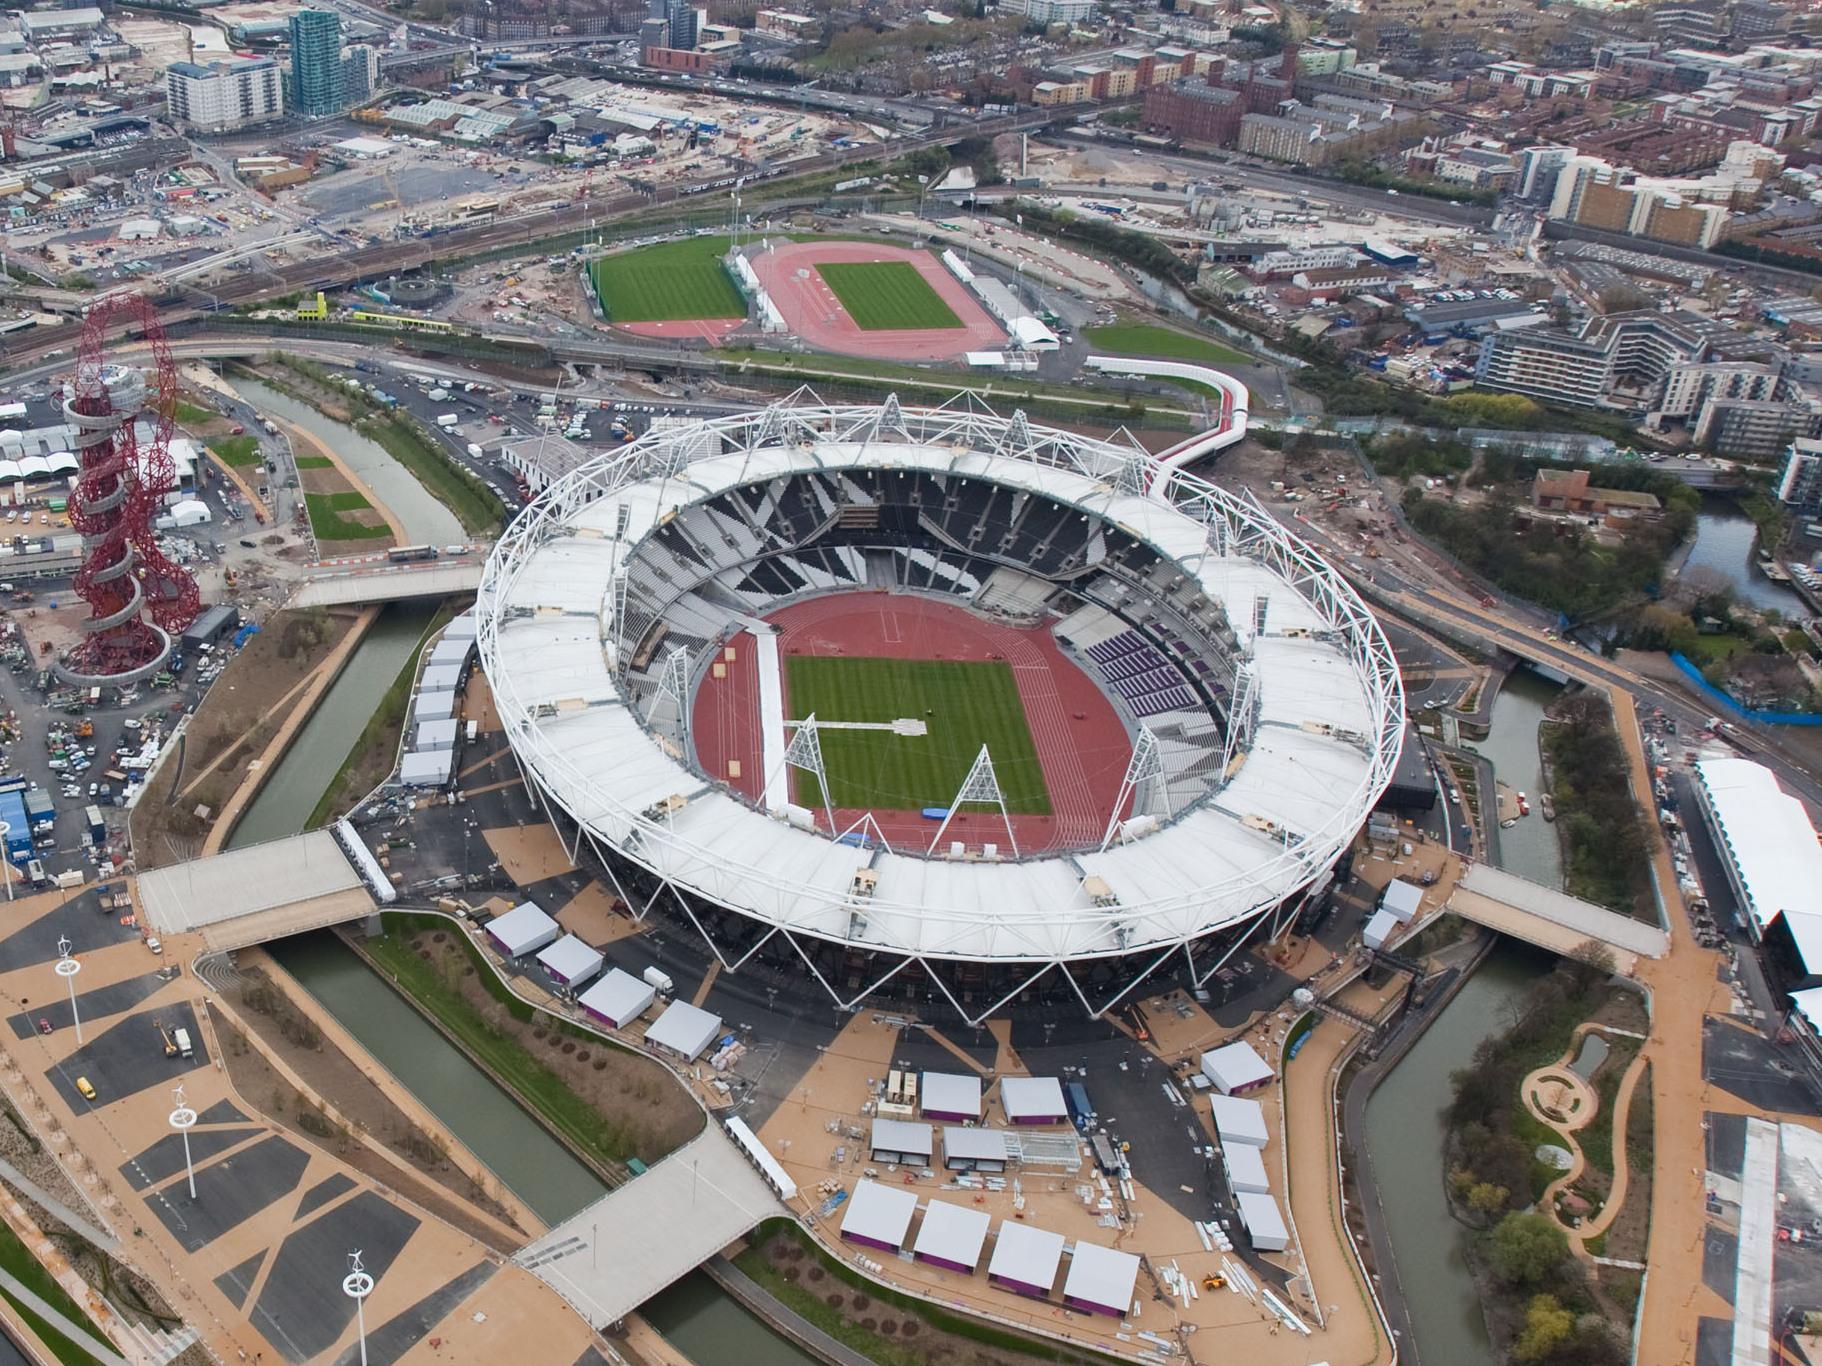 FileOlympic Stadium London 16 April 2012jpg